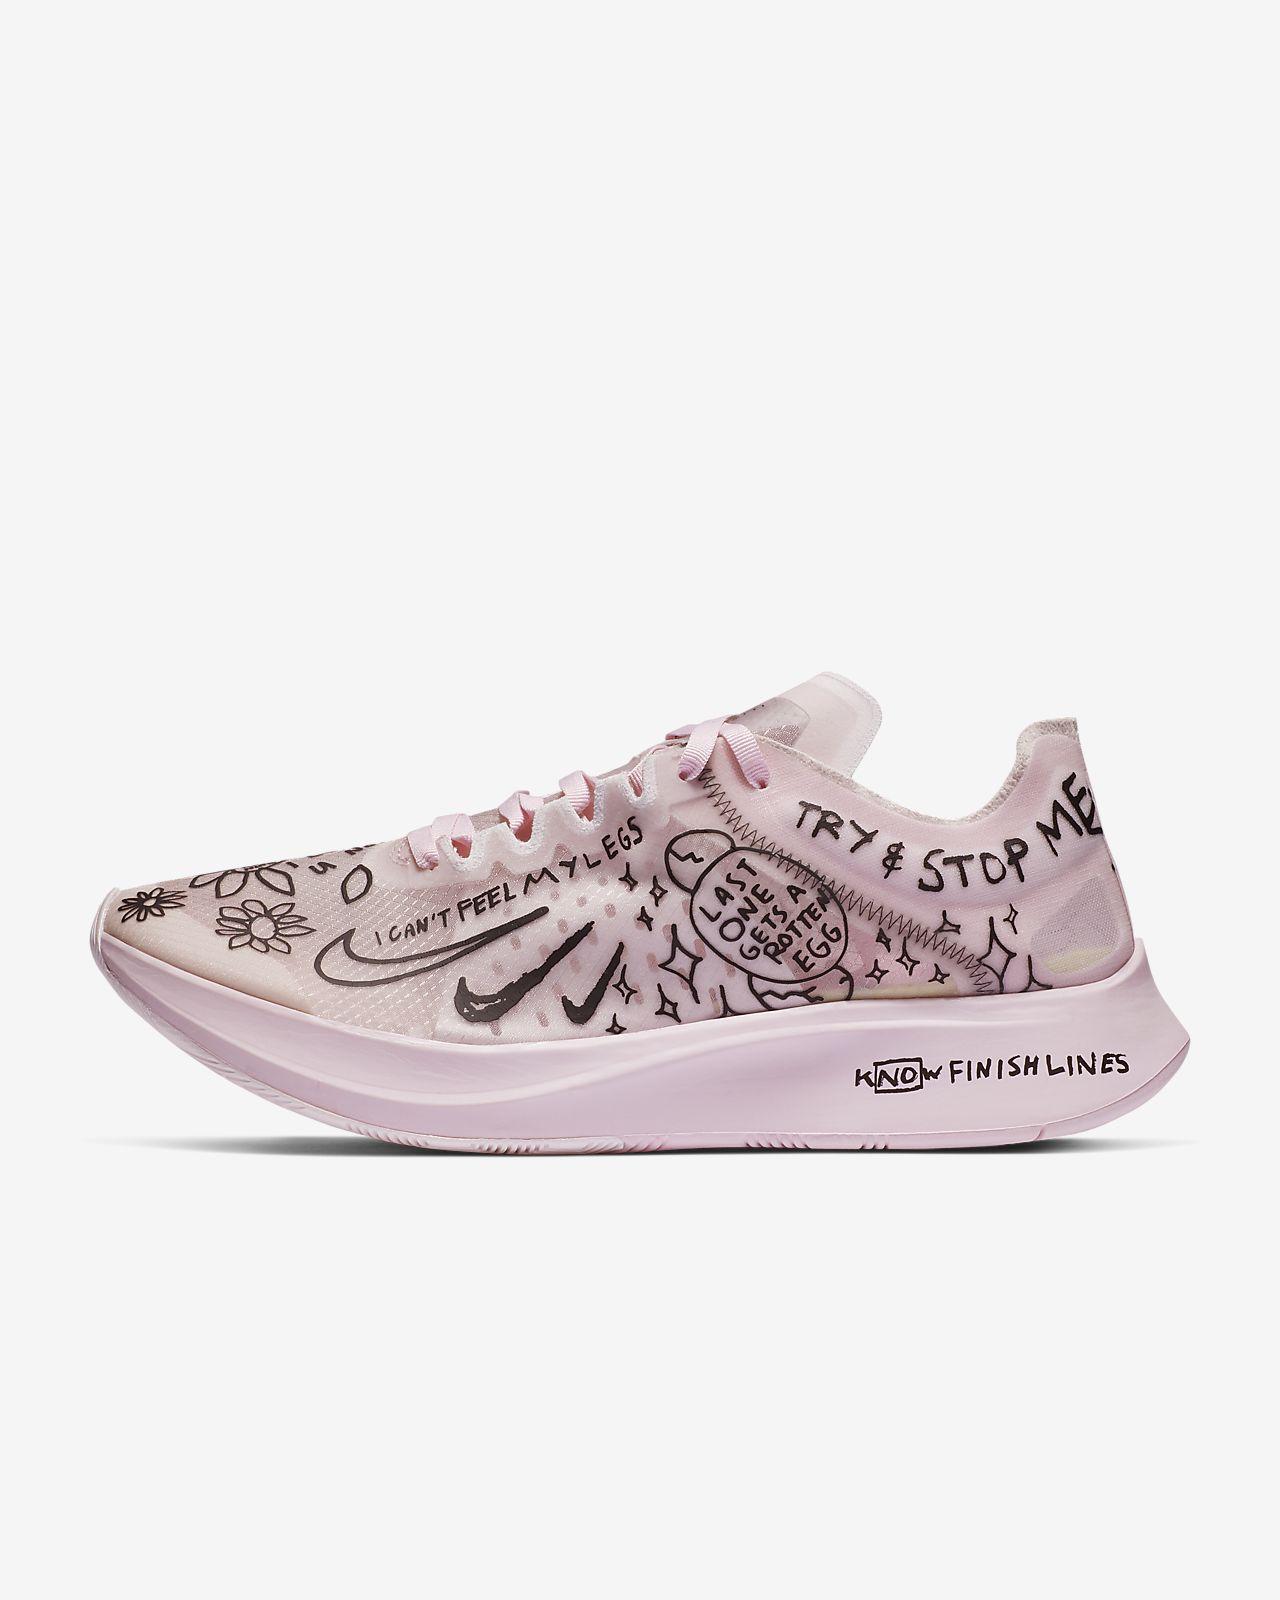 Nike Zoom Fly SP Fast男/女跑步鞋